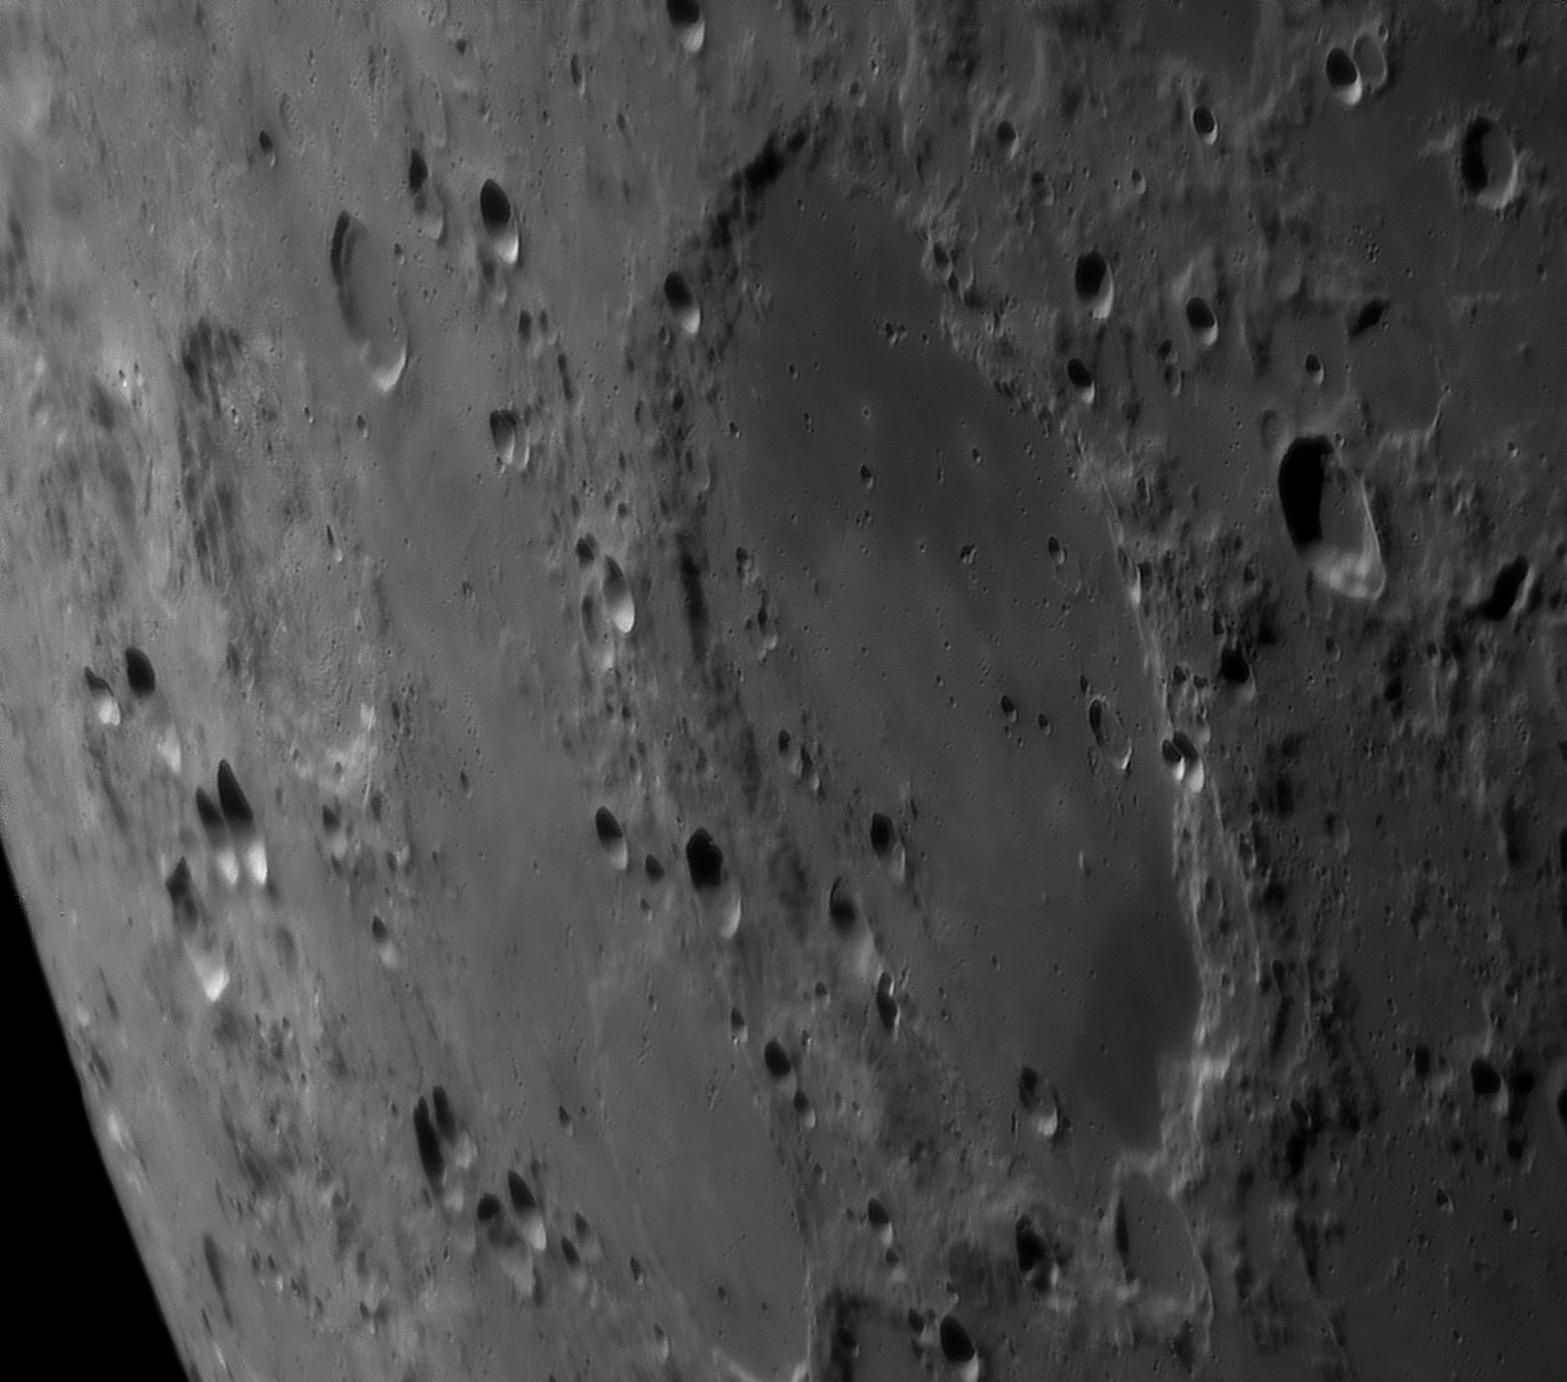 Lune 25/08/2019 C14 ASI290 Barlow 2x Clavé : SCHICKARD